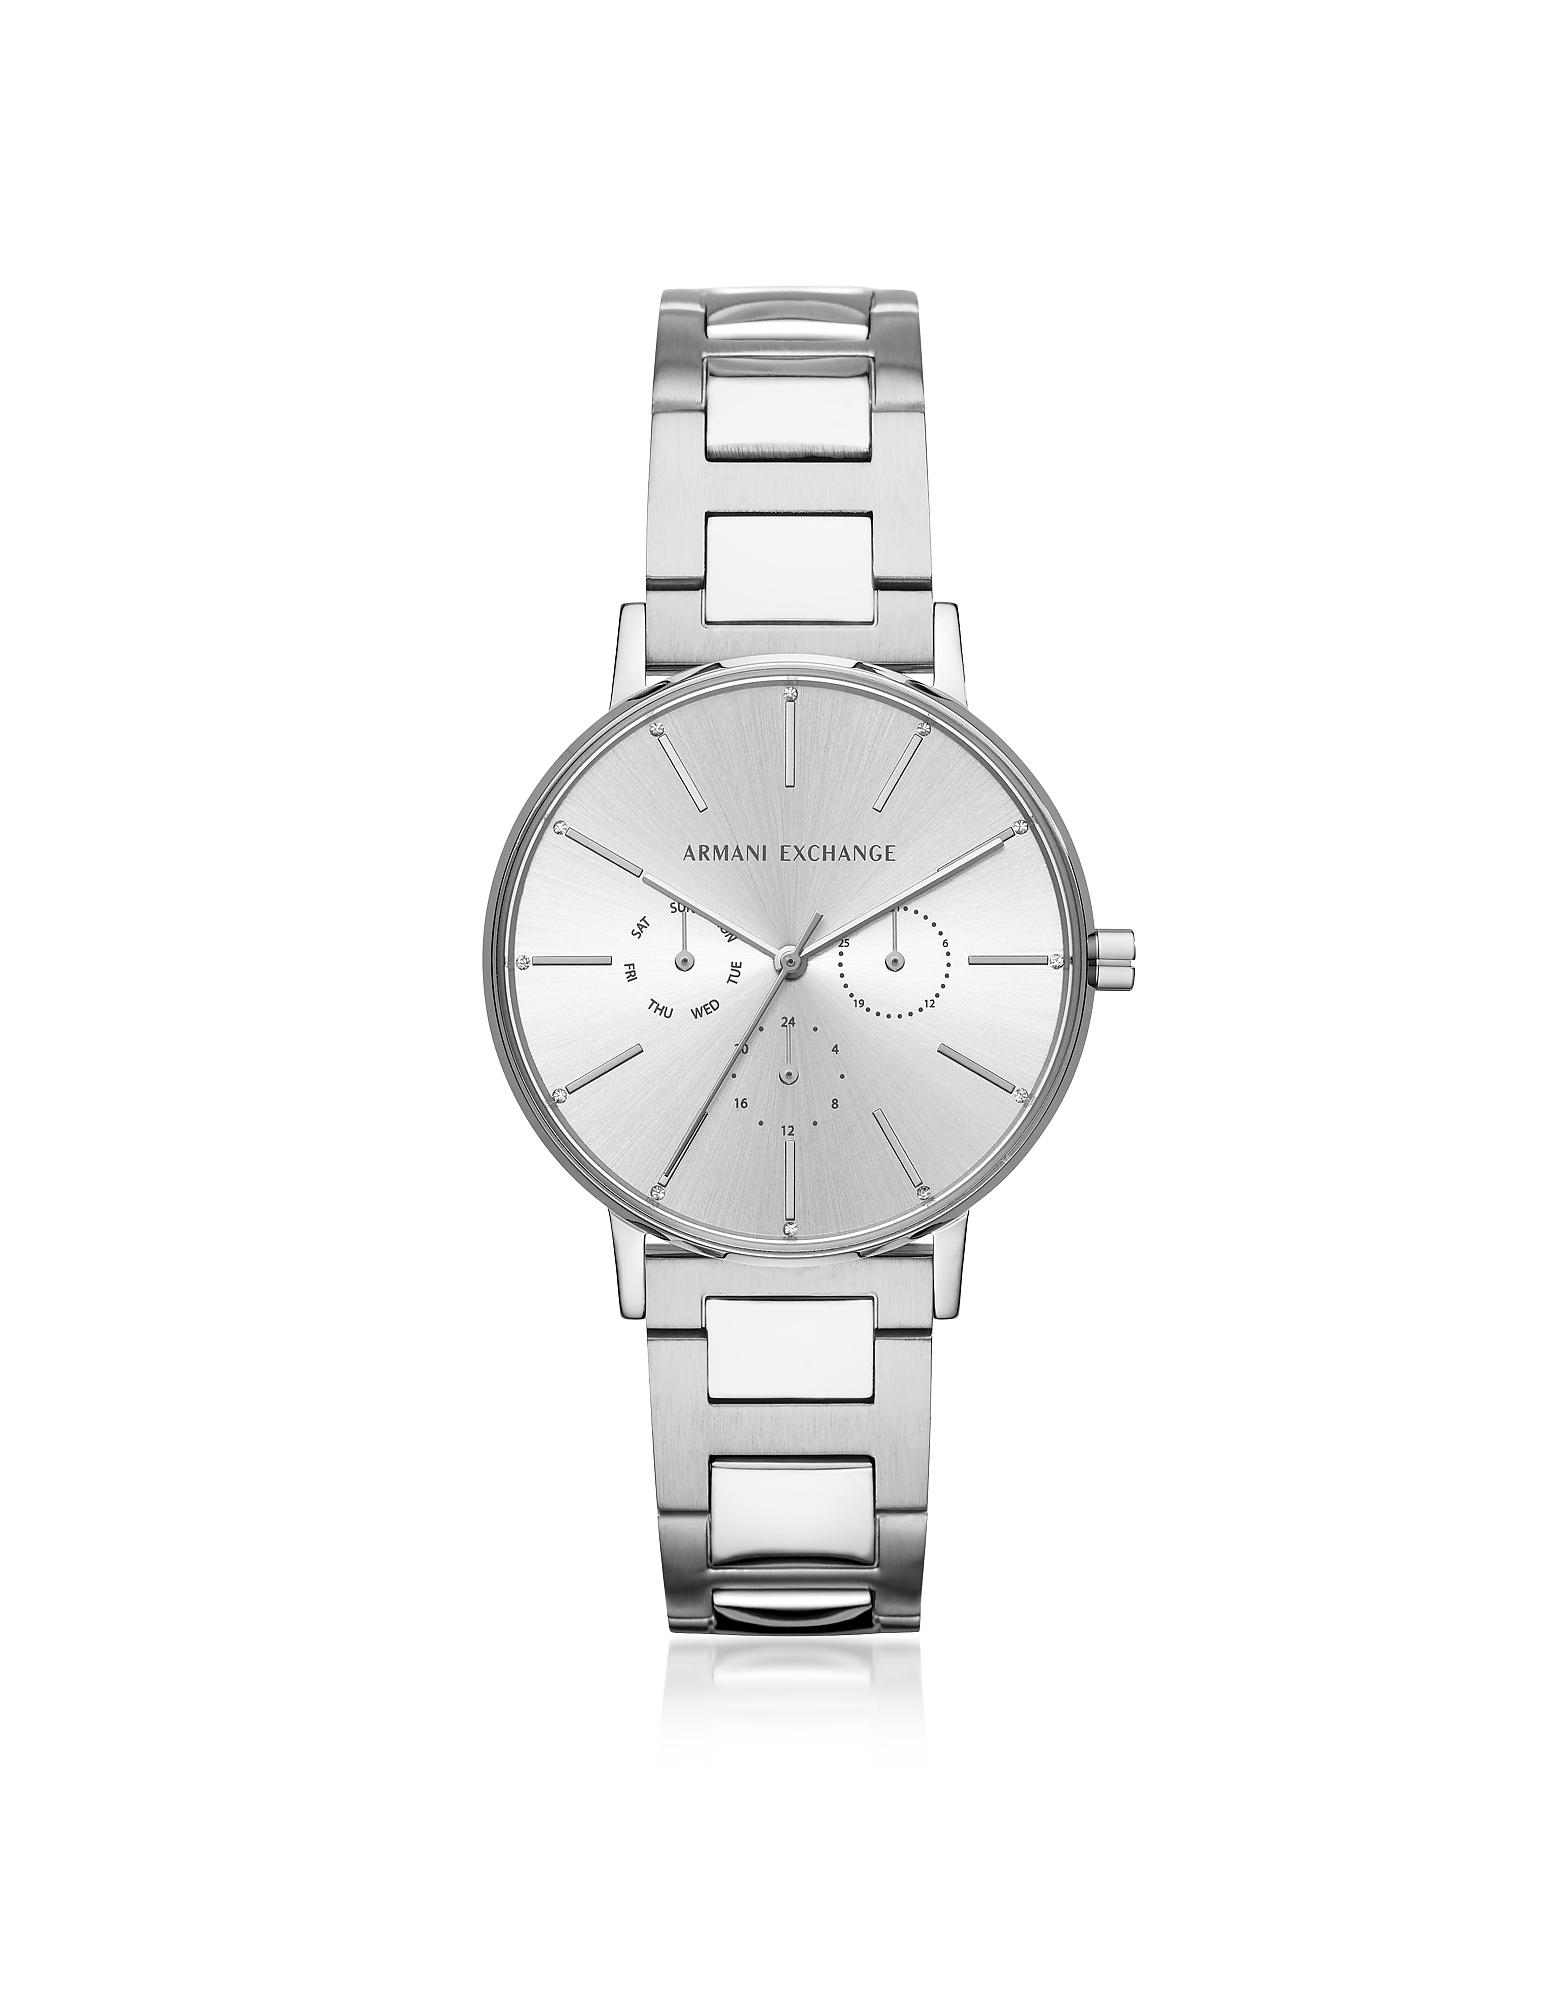 Armani Exchange Designer Women's Watches, Lola Stainless Steel Chronograph Women's Watch